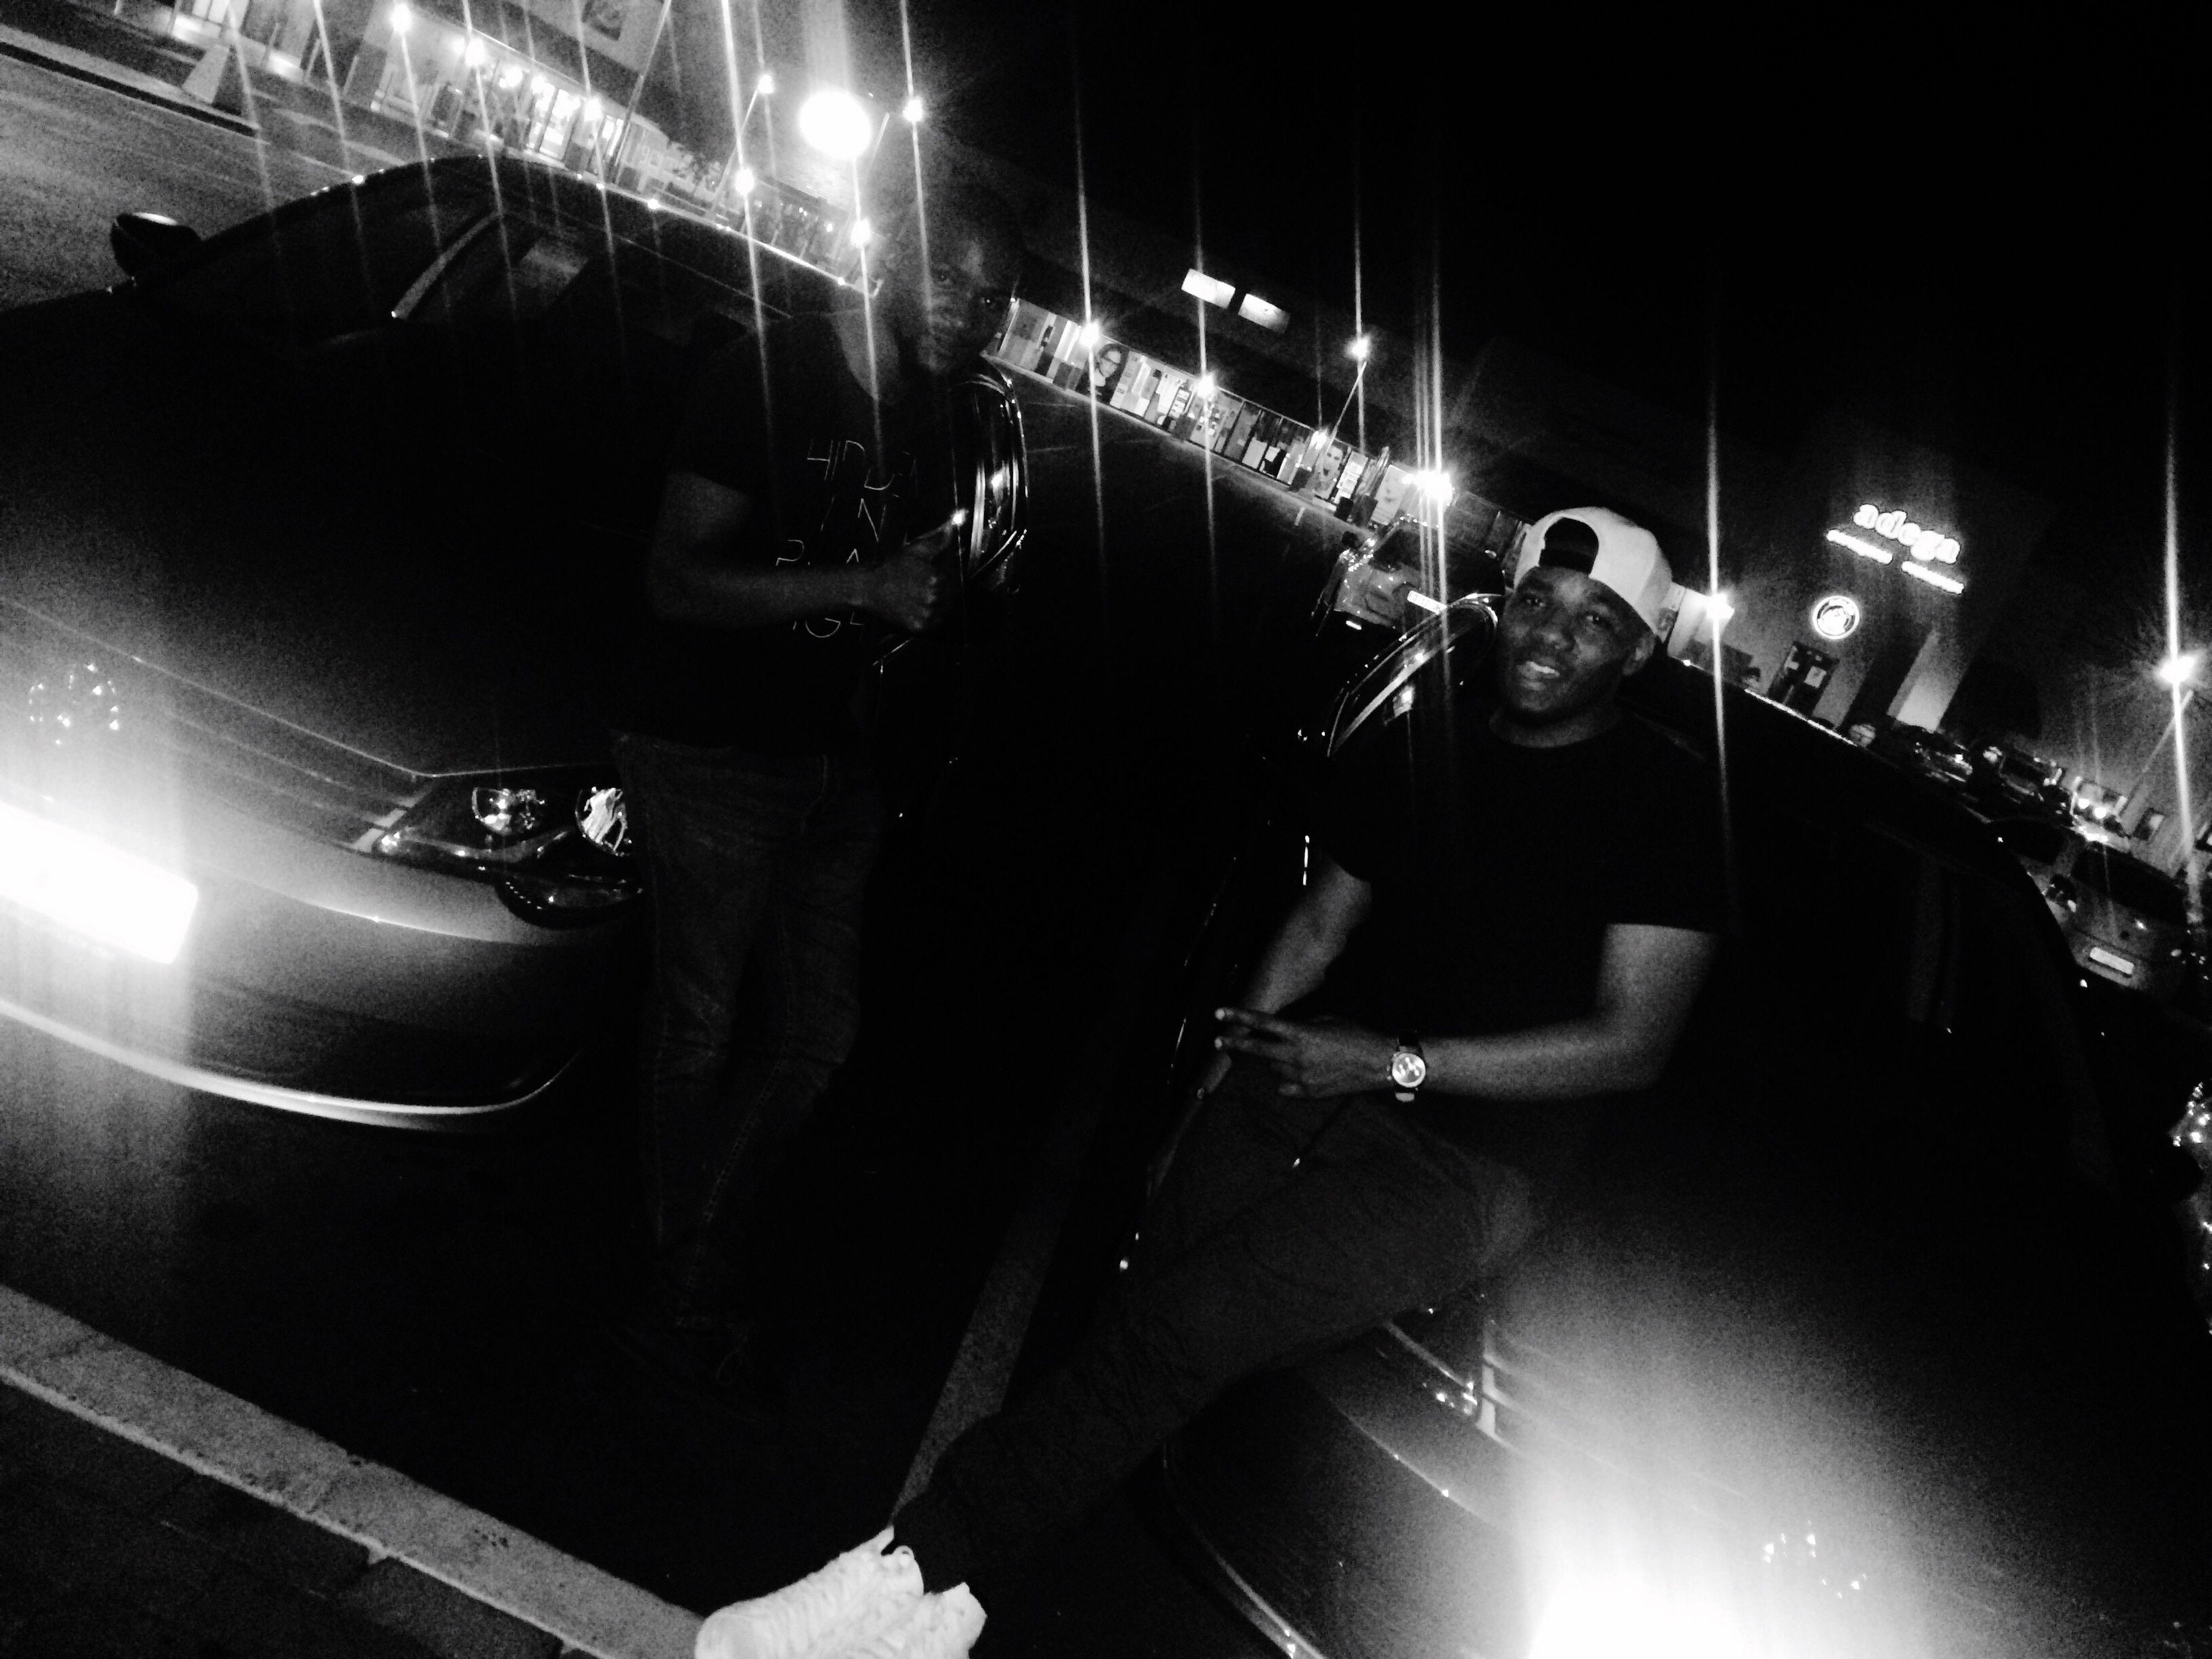 night, illuminated, land vehicle, transportation, mode of transport, men, lighting equipment, car, street light, lifestyles, street, leisure activity, city, arts culture and entertainment, light - natural phenomenon, city life, light beam, incidental people, building exterior